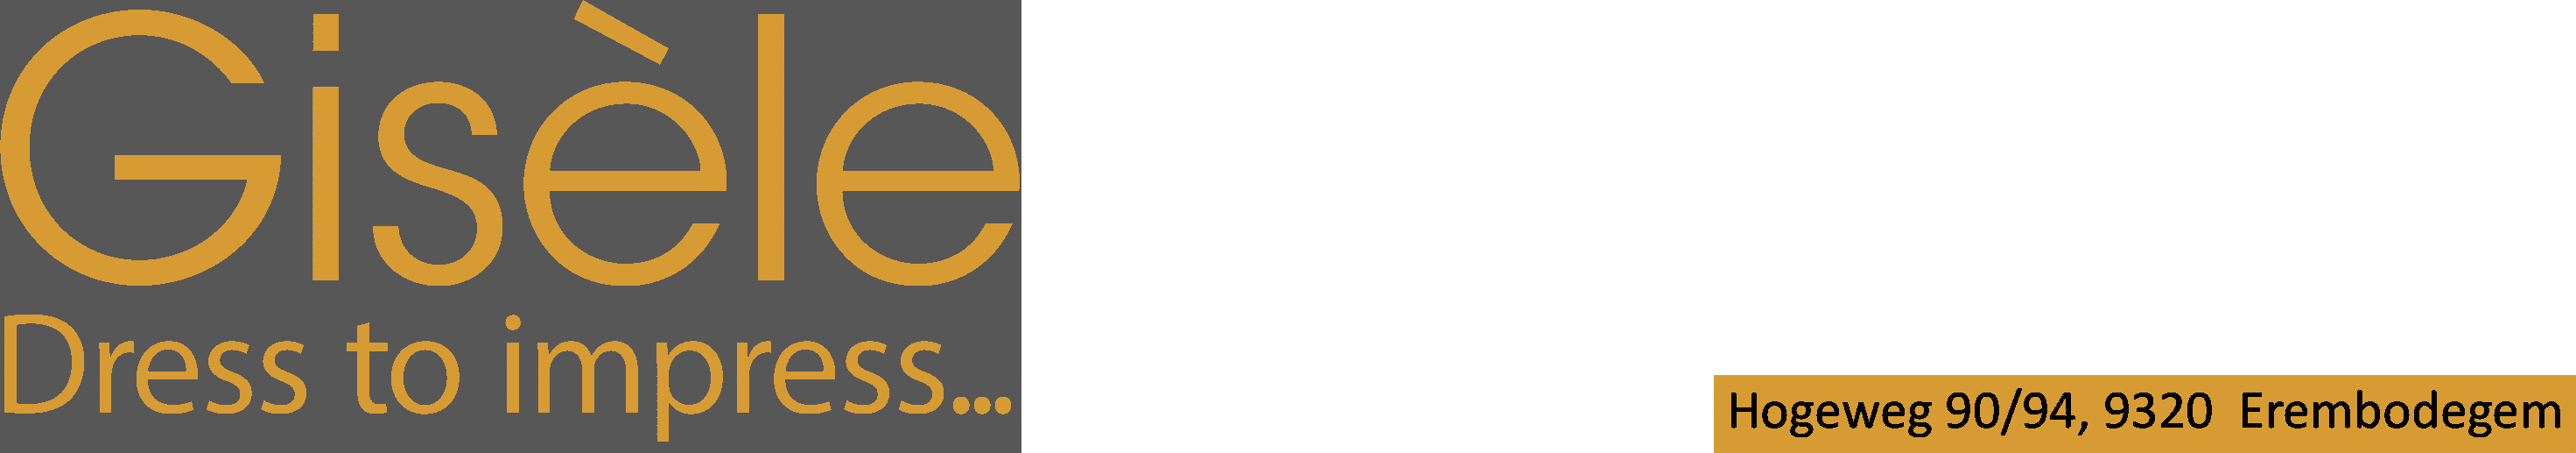 Dameskleding Gisèle logo